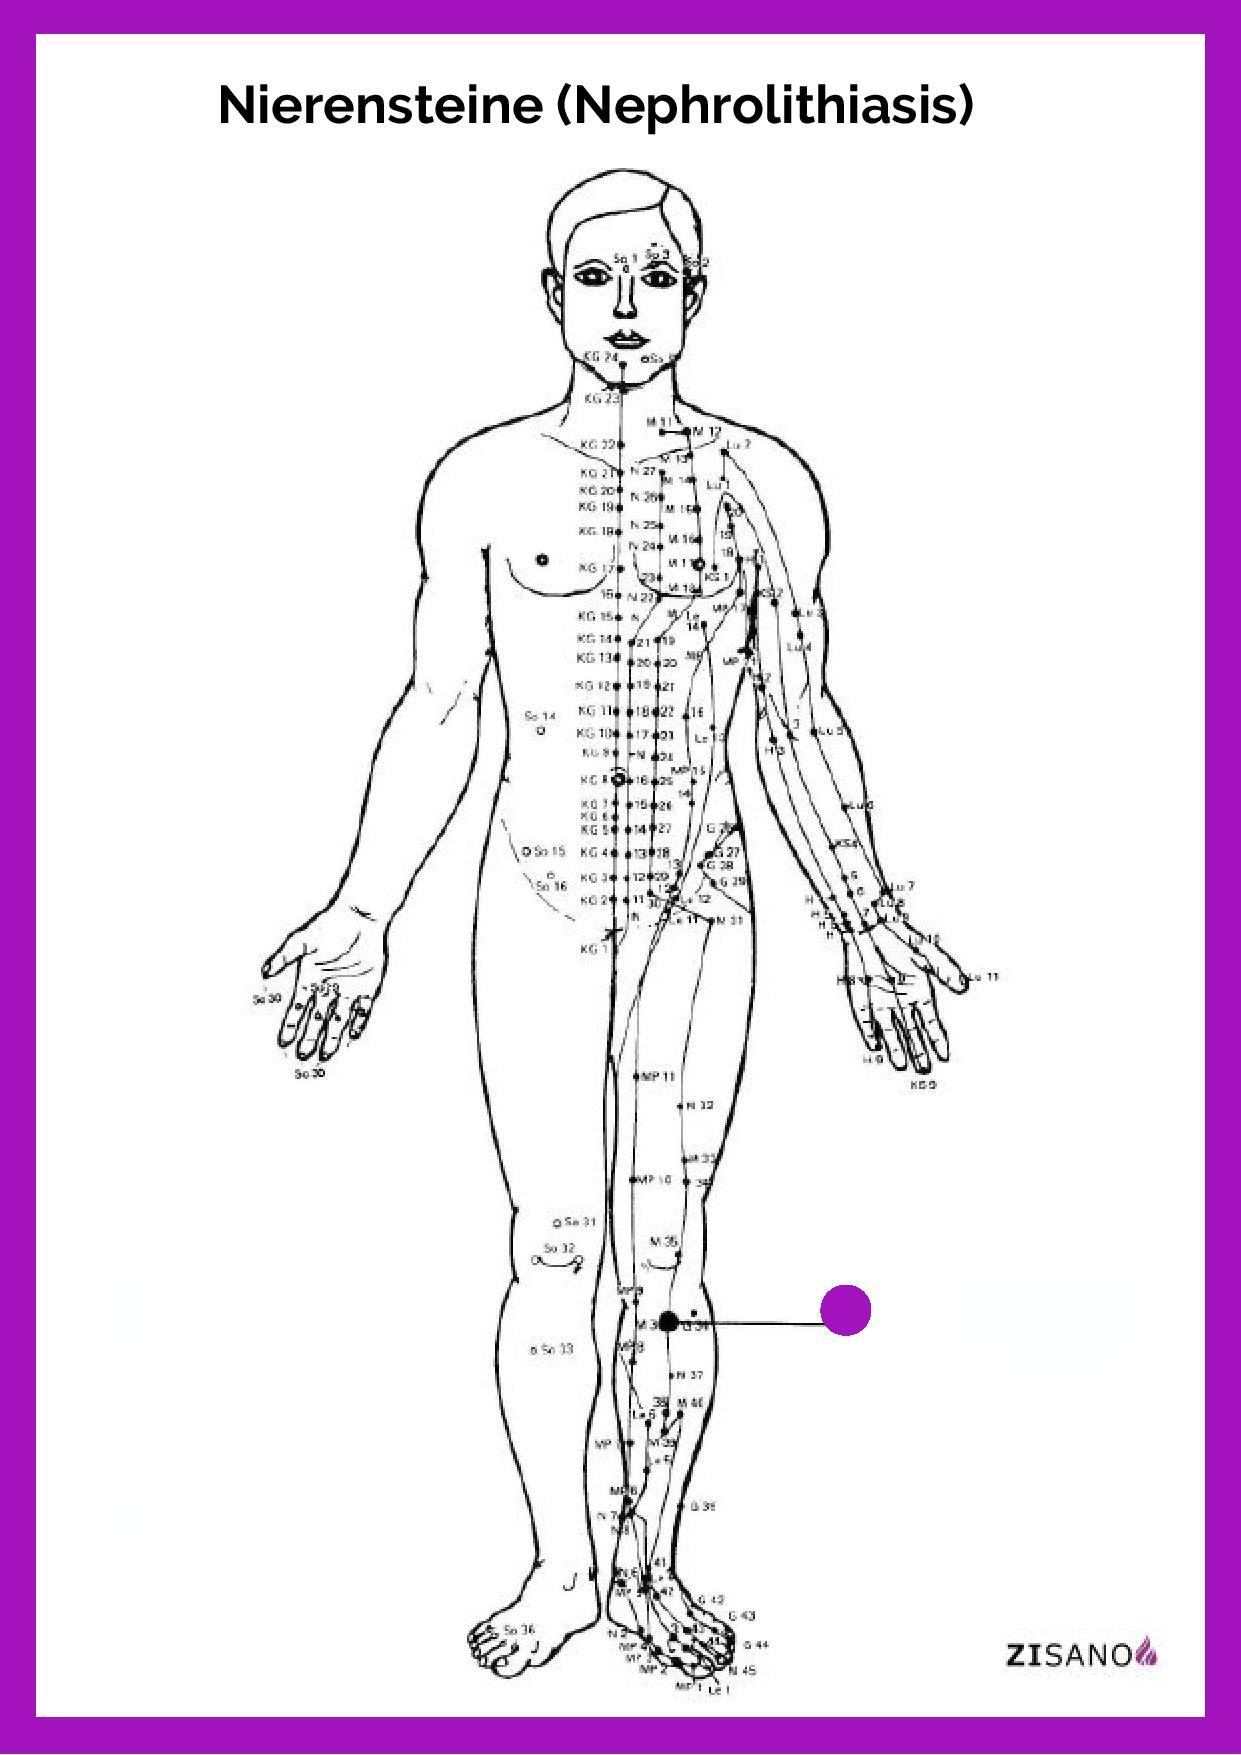 Meridiane - Nierensteine - Nephrolithiasis - Beschwerden